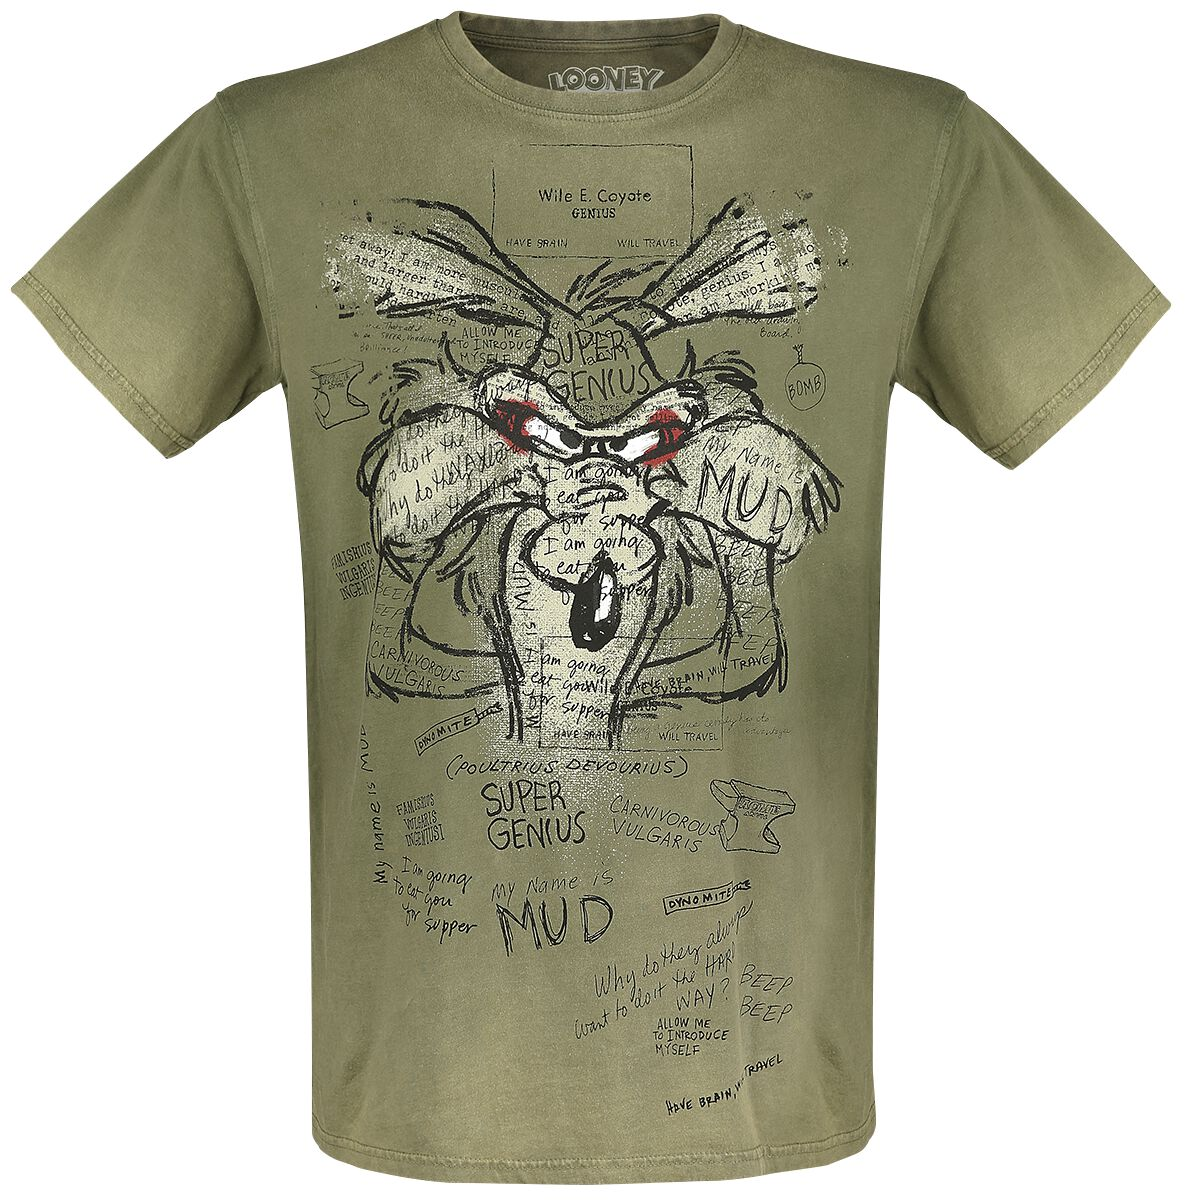 Merch dla Fanów - Koszulki - T-Shirt Looney Tunes Wile E. Coyote - Inner Thoughts T-Shirt khaki - 375283